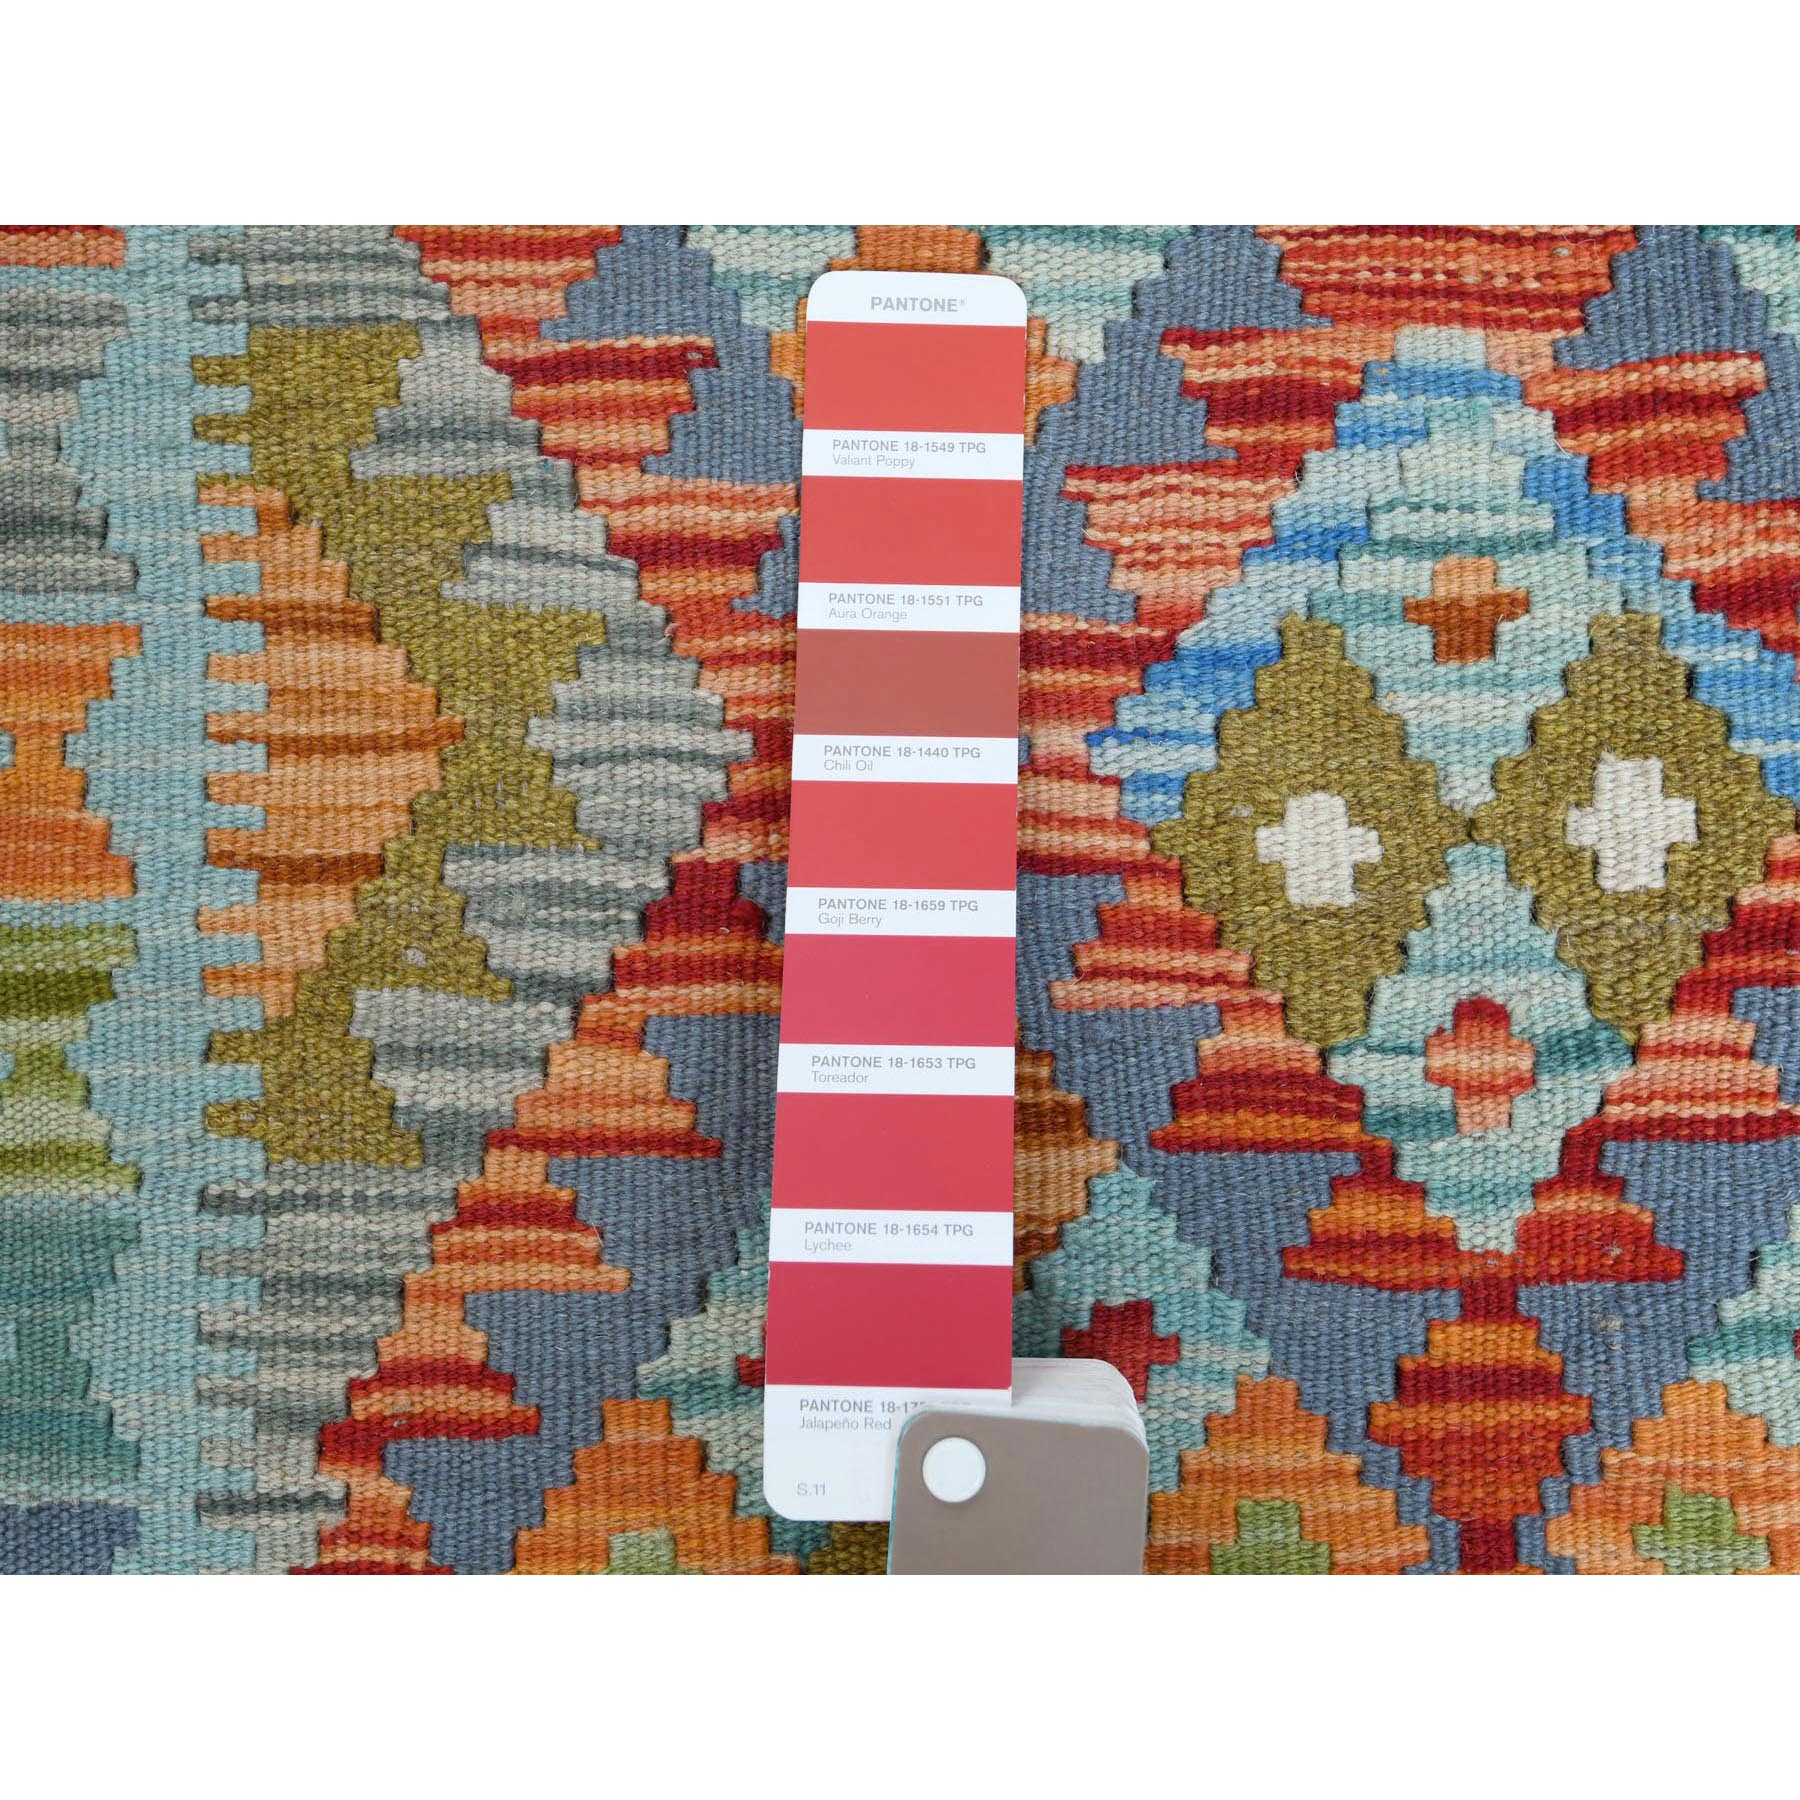 "3'x4'3"" Colorful Tribal Design Vibrant Wool Afghan Kilim Reversible Flat Weave Hand Woven Oriental Rug"